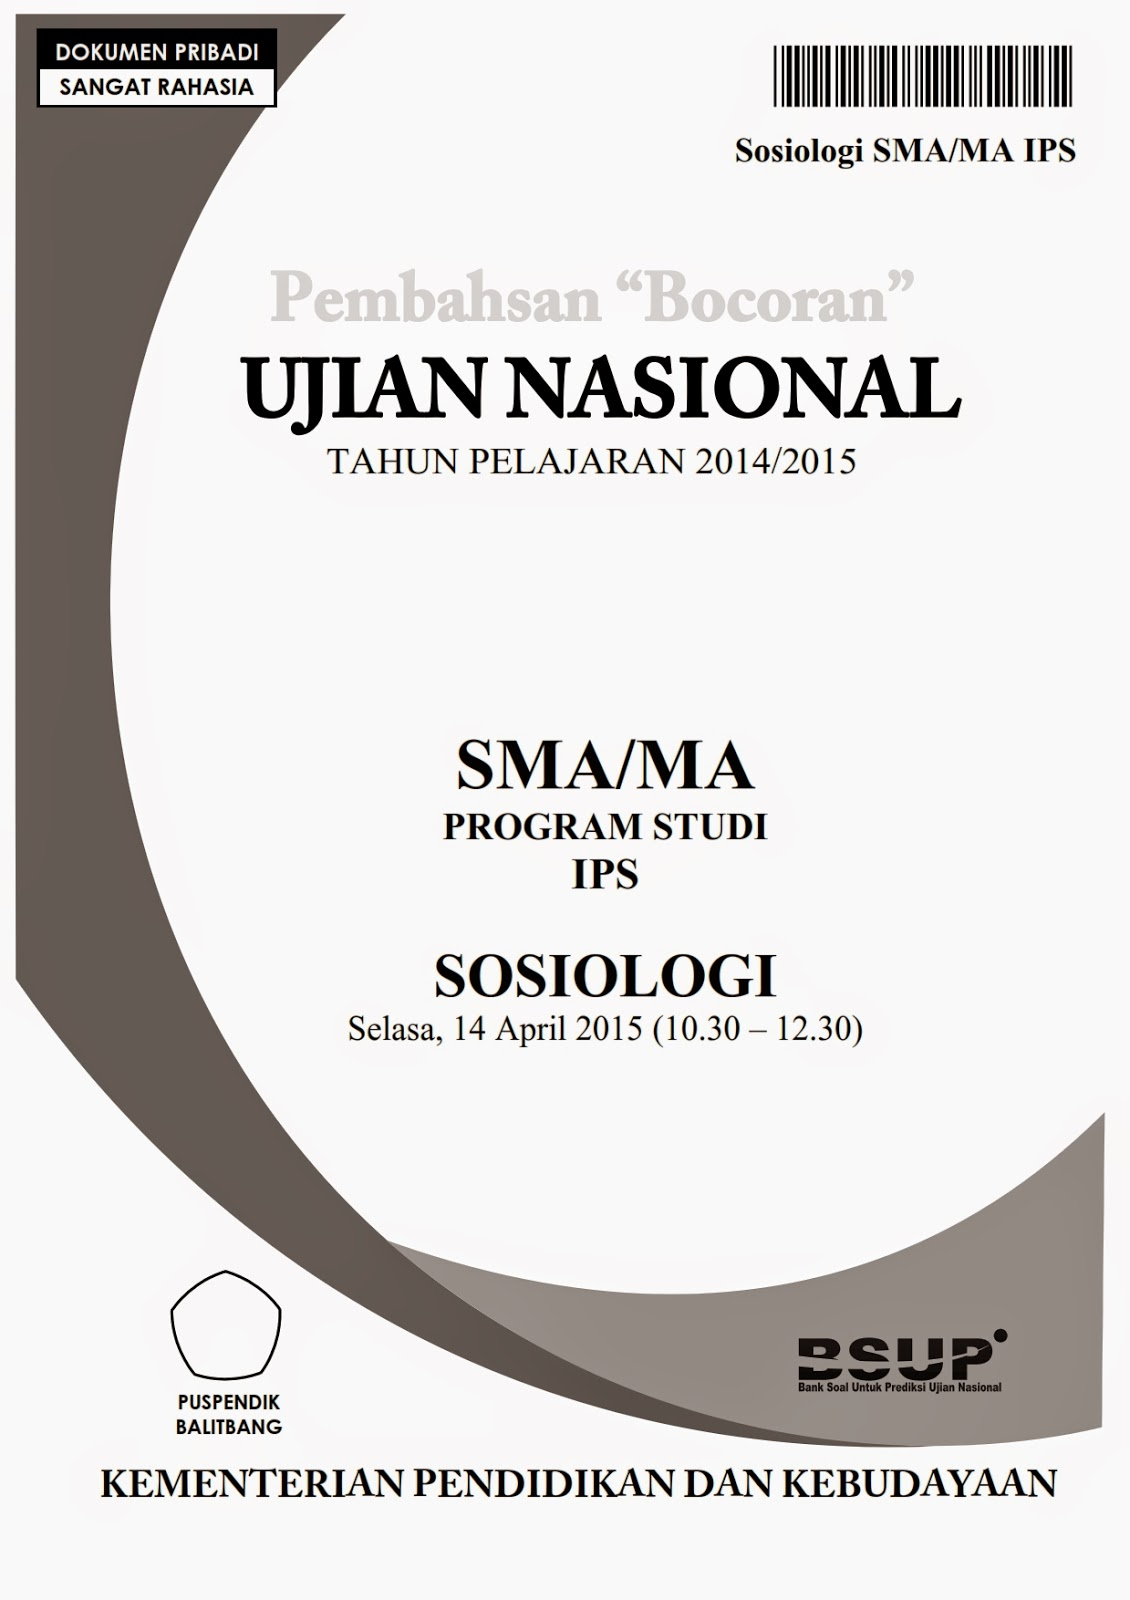 Pembahasan Bocoran Soal Un Sosiologi Sma 2015